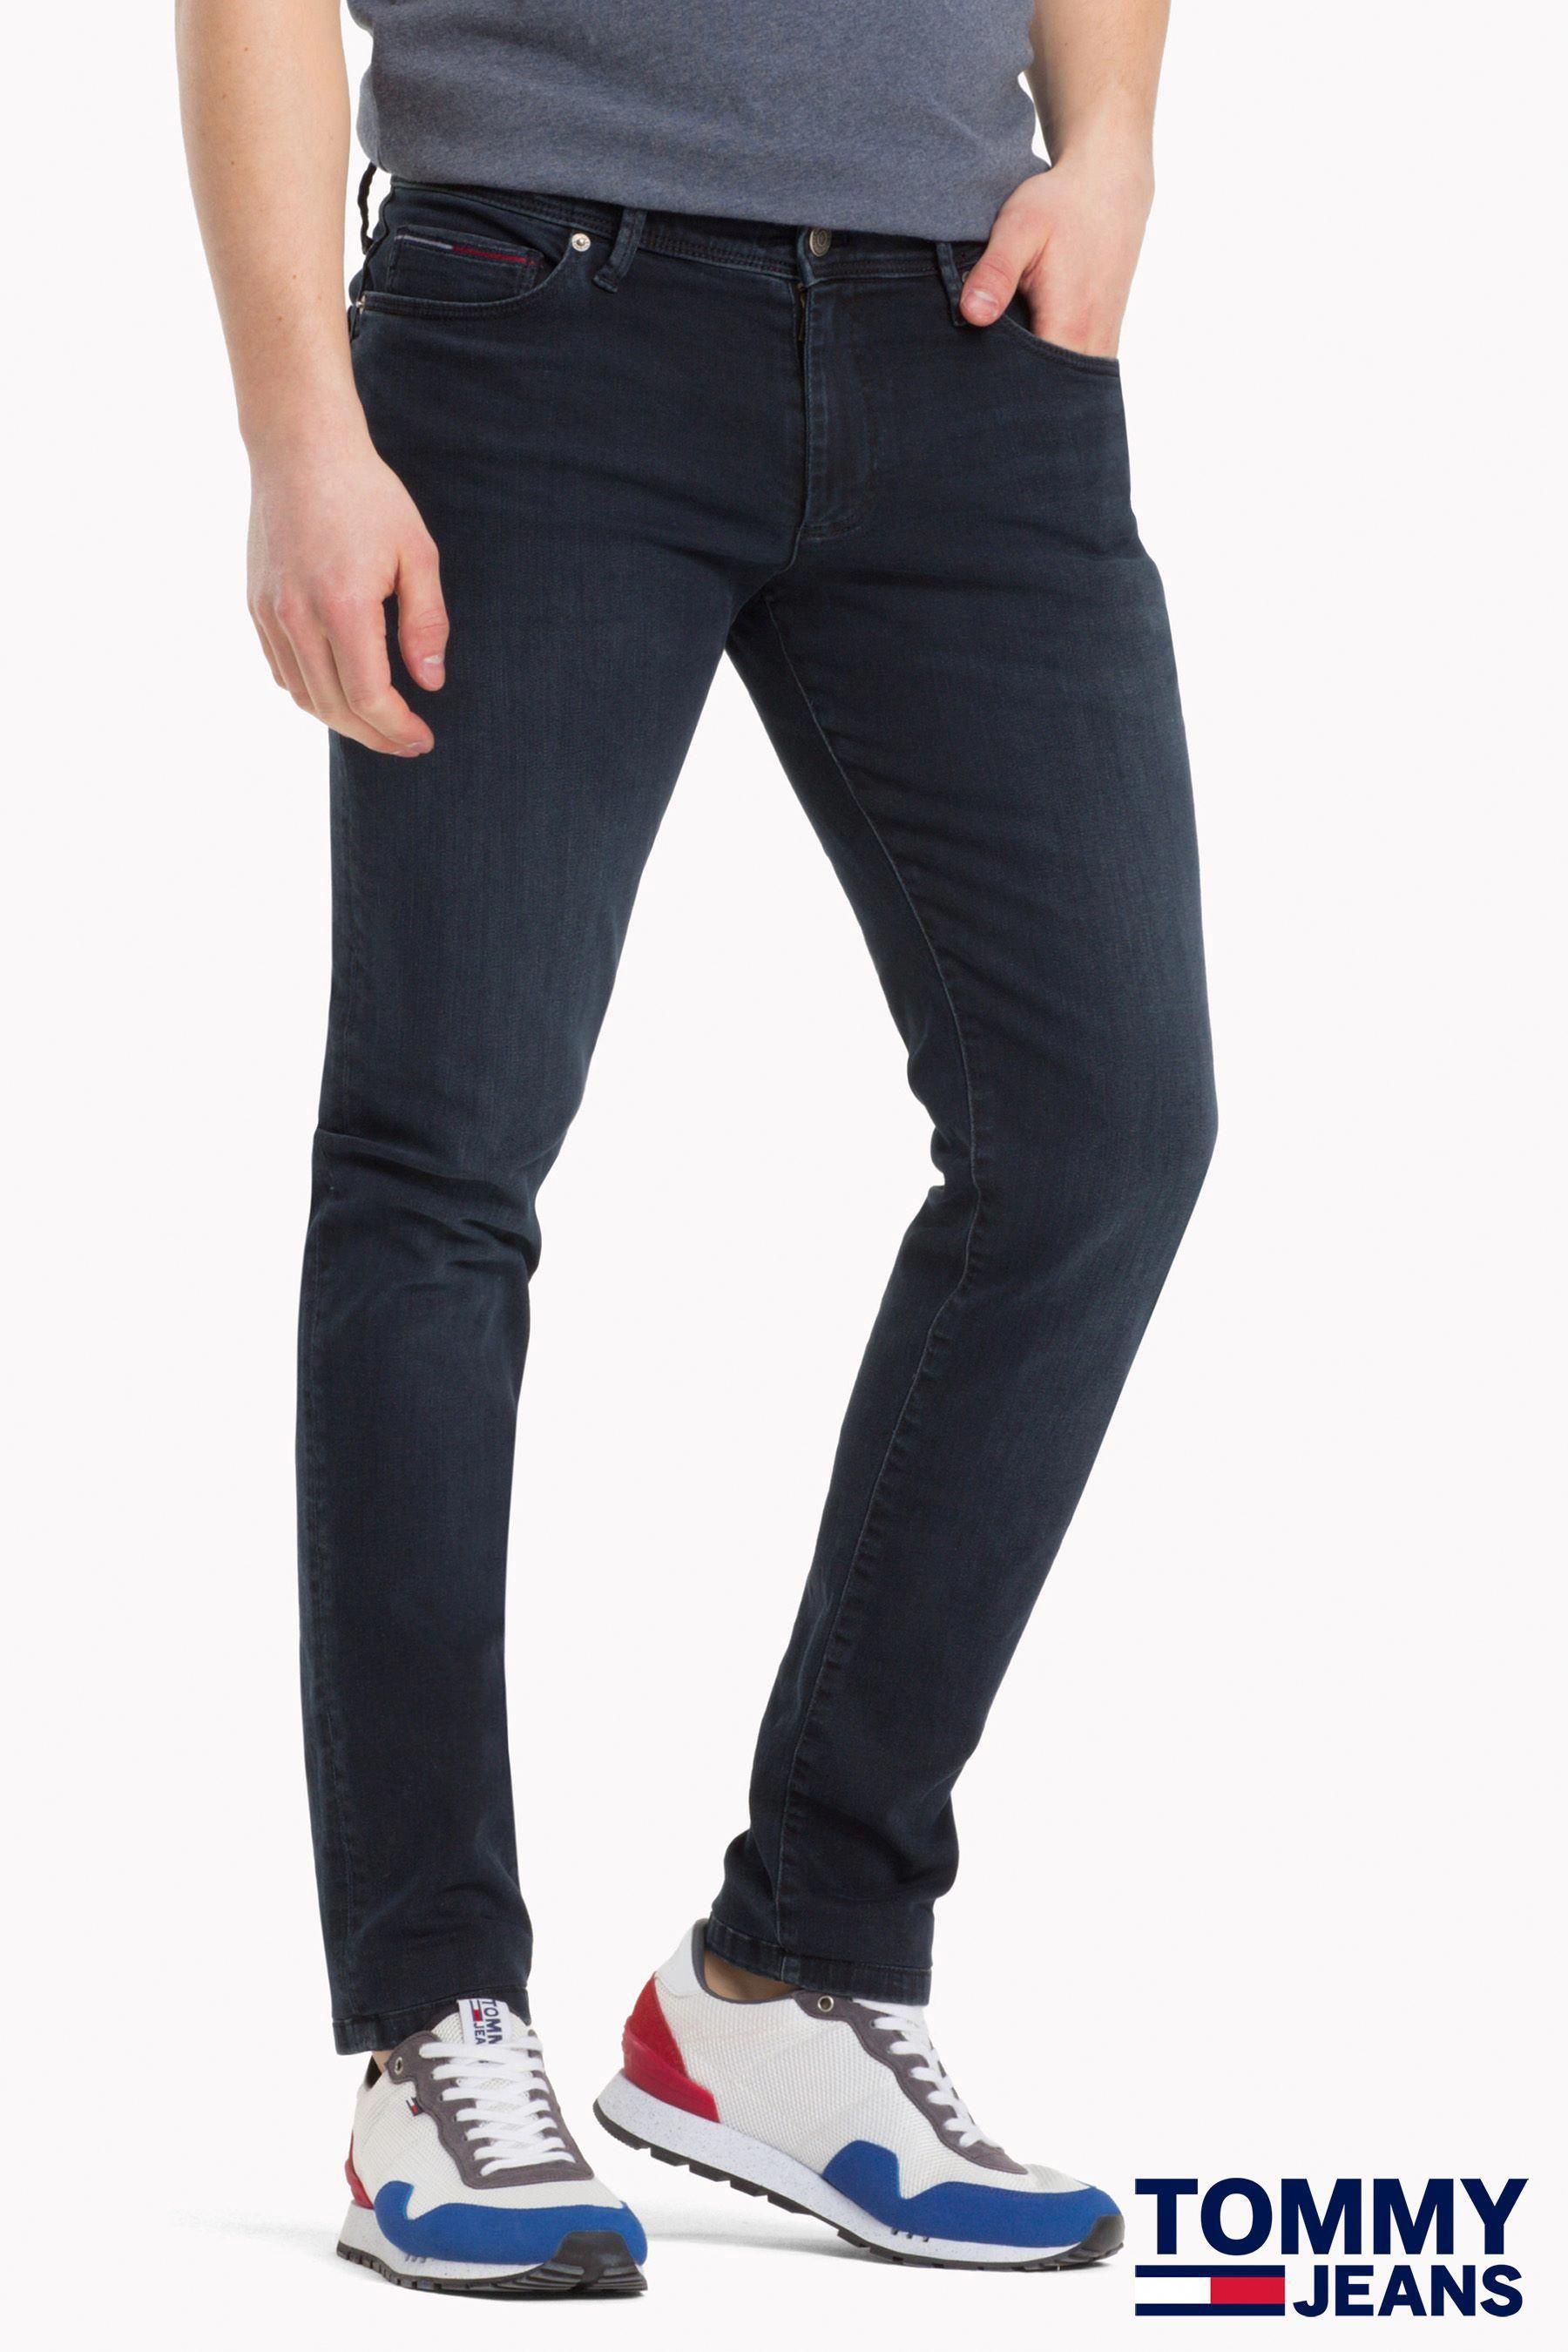 76225b8c Mens Tommy Jeans Skinny Simon Cobble Black Jean - Grey | Mens Jeans ...